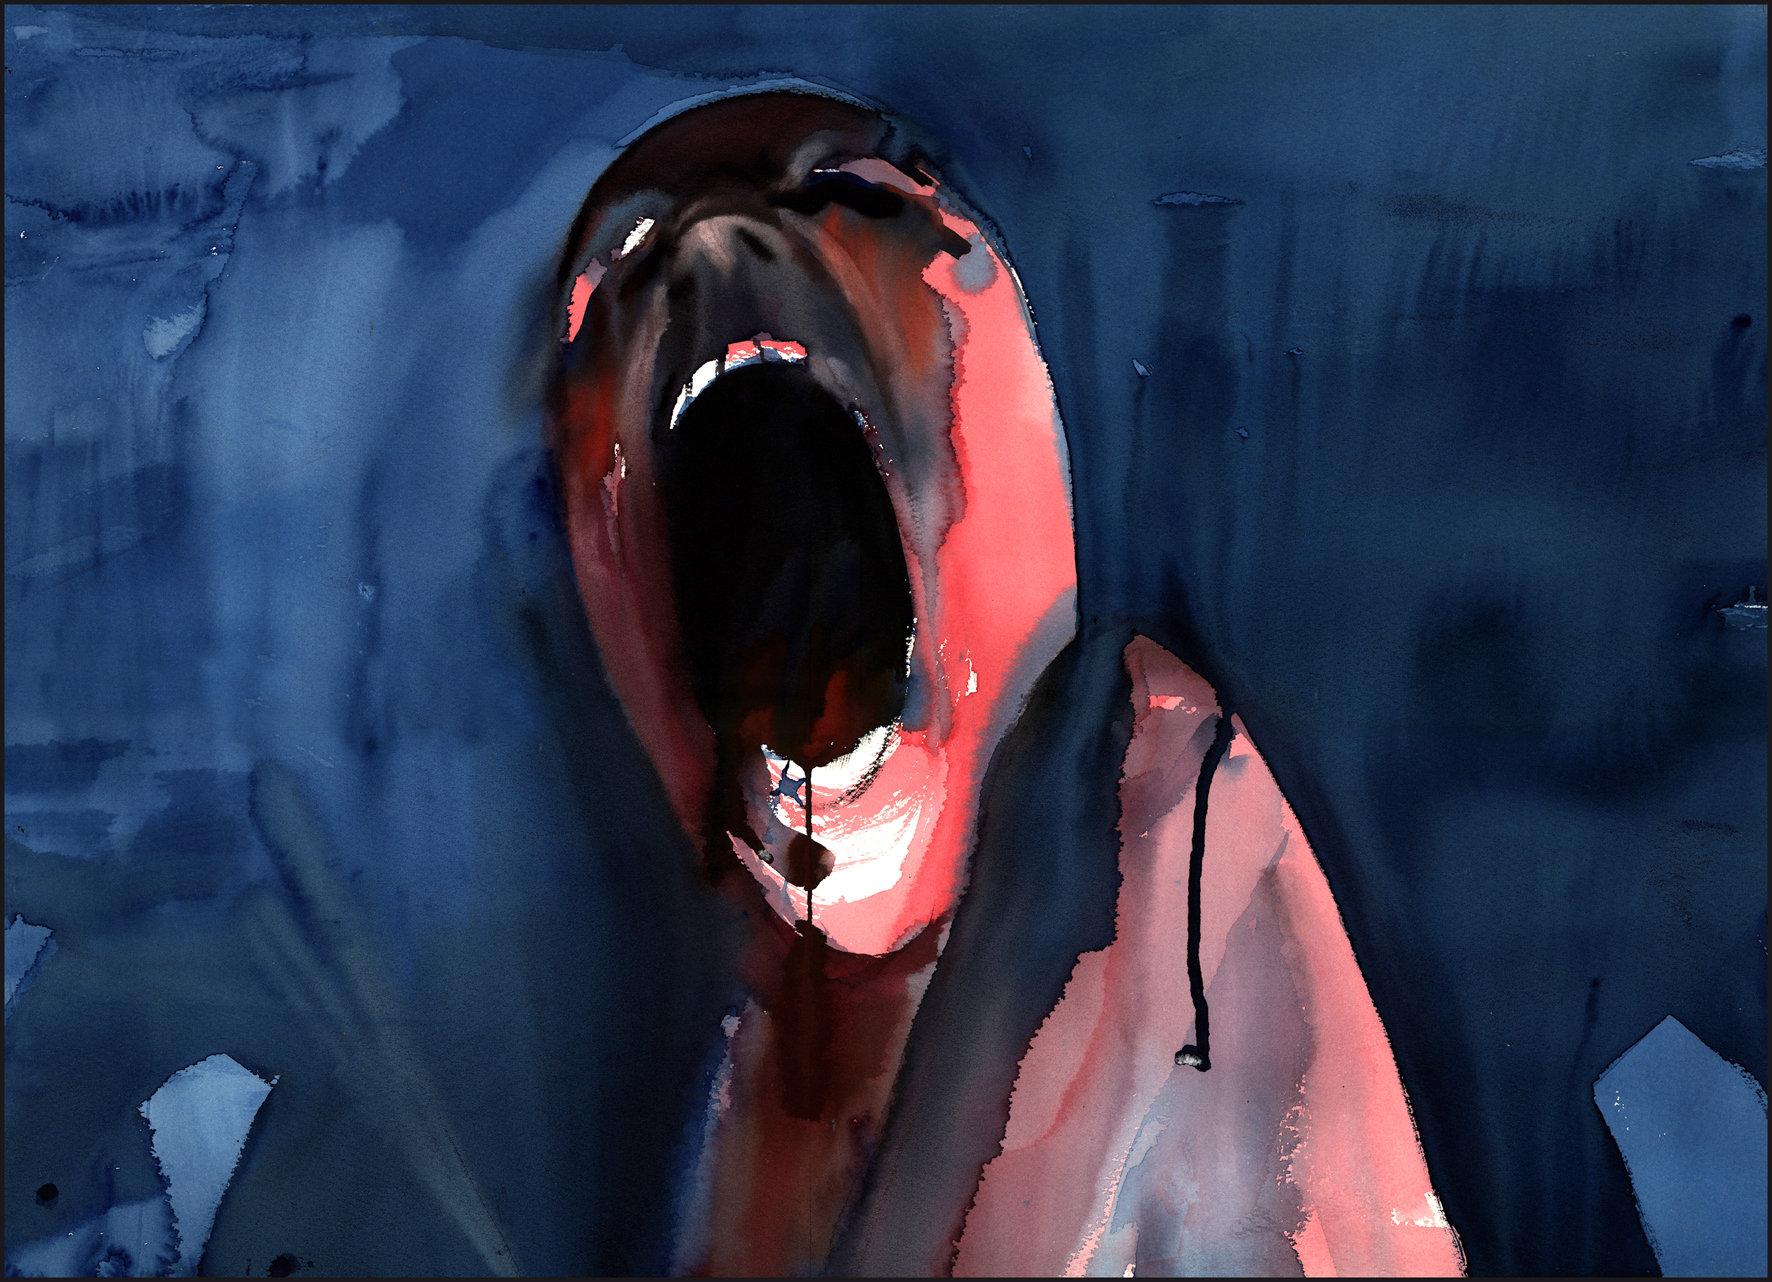 wall-scream-smjpg-5a08ff4e80c21b4e